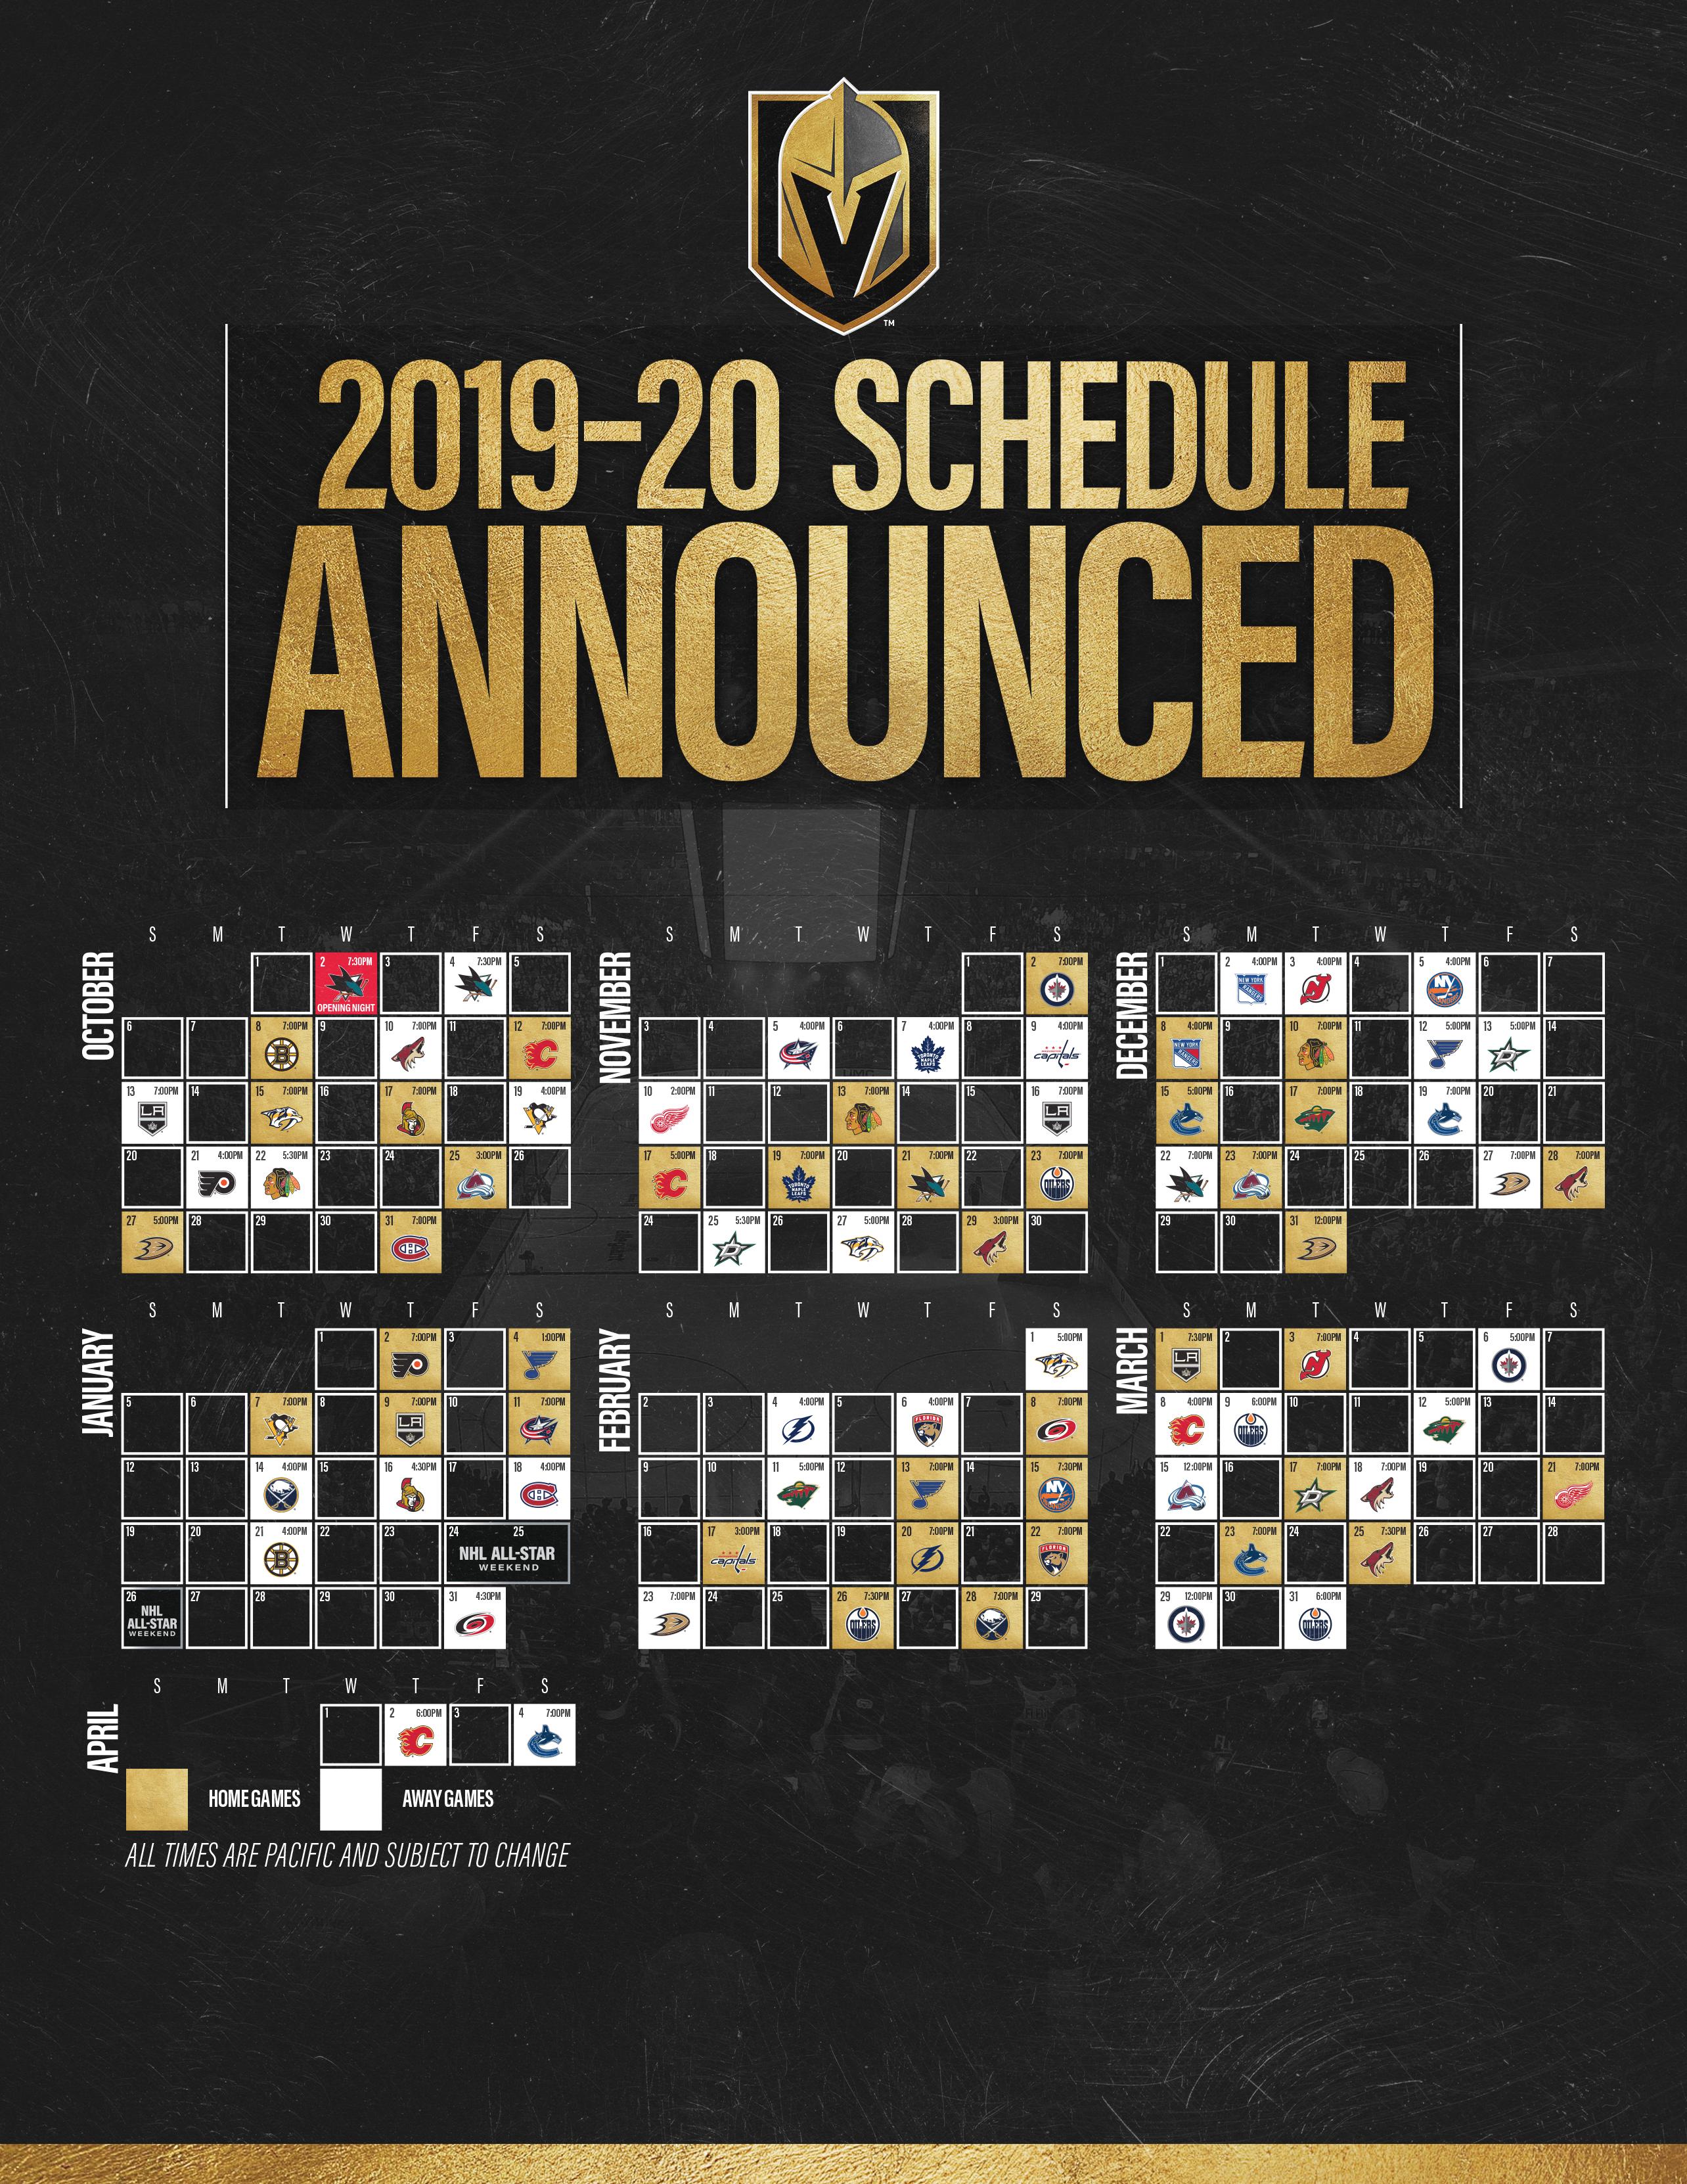 Vegas Golden Knights Schedule | Vegas Golden Knights for Complete Nashville Predators 2019-2020 Schedule